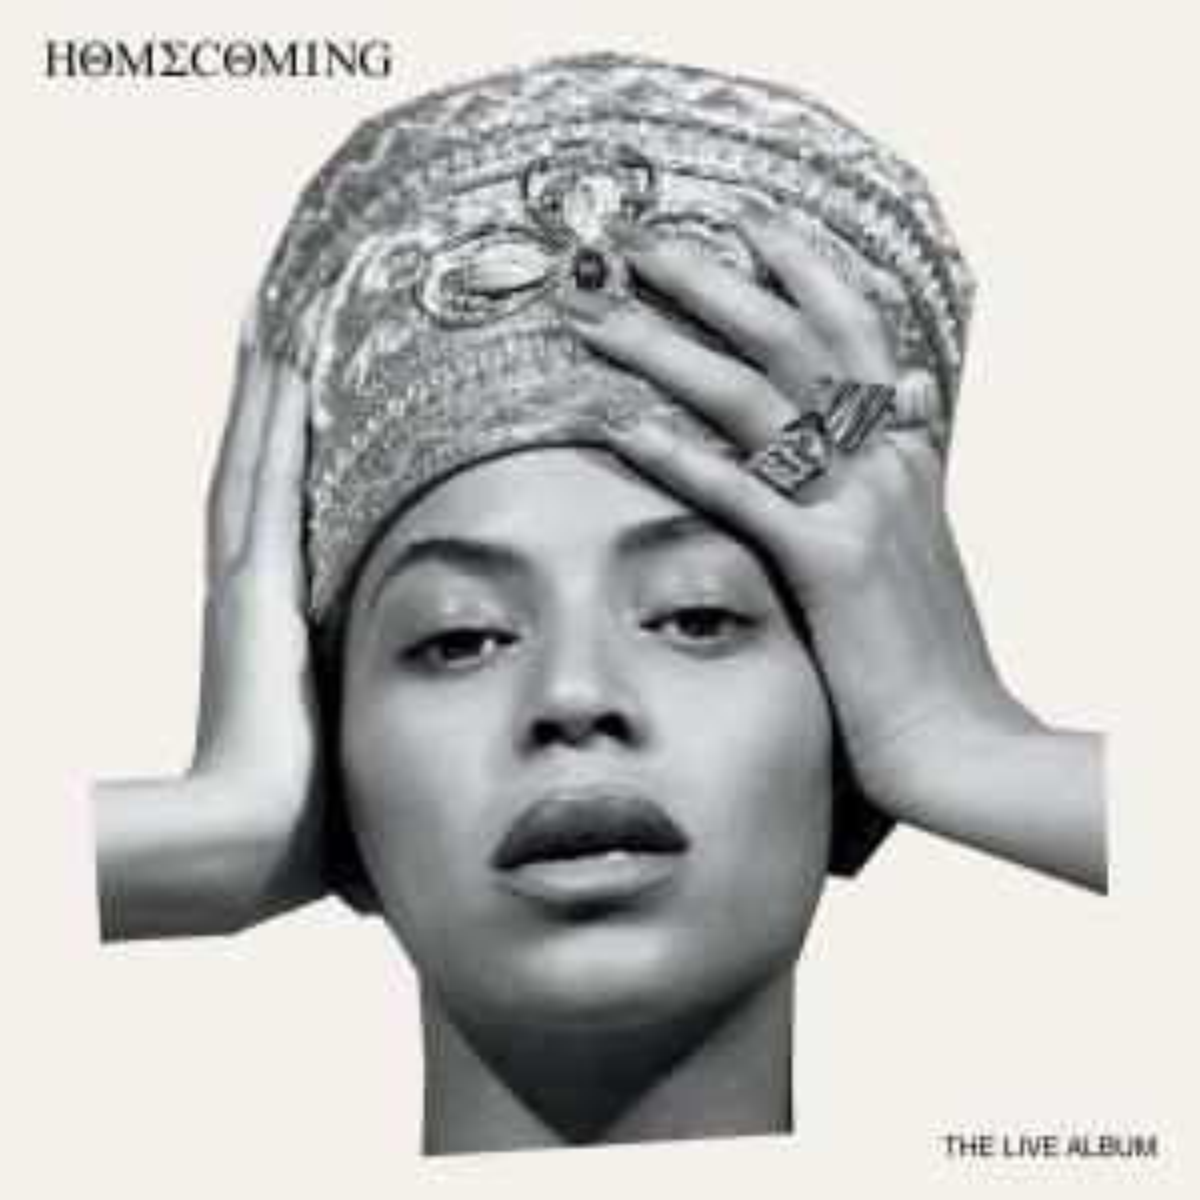 Виниловая пластинка Beyonce - Homecoming: The Live Album (Box Set/Black Vinyl)